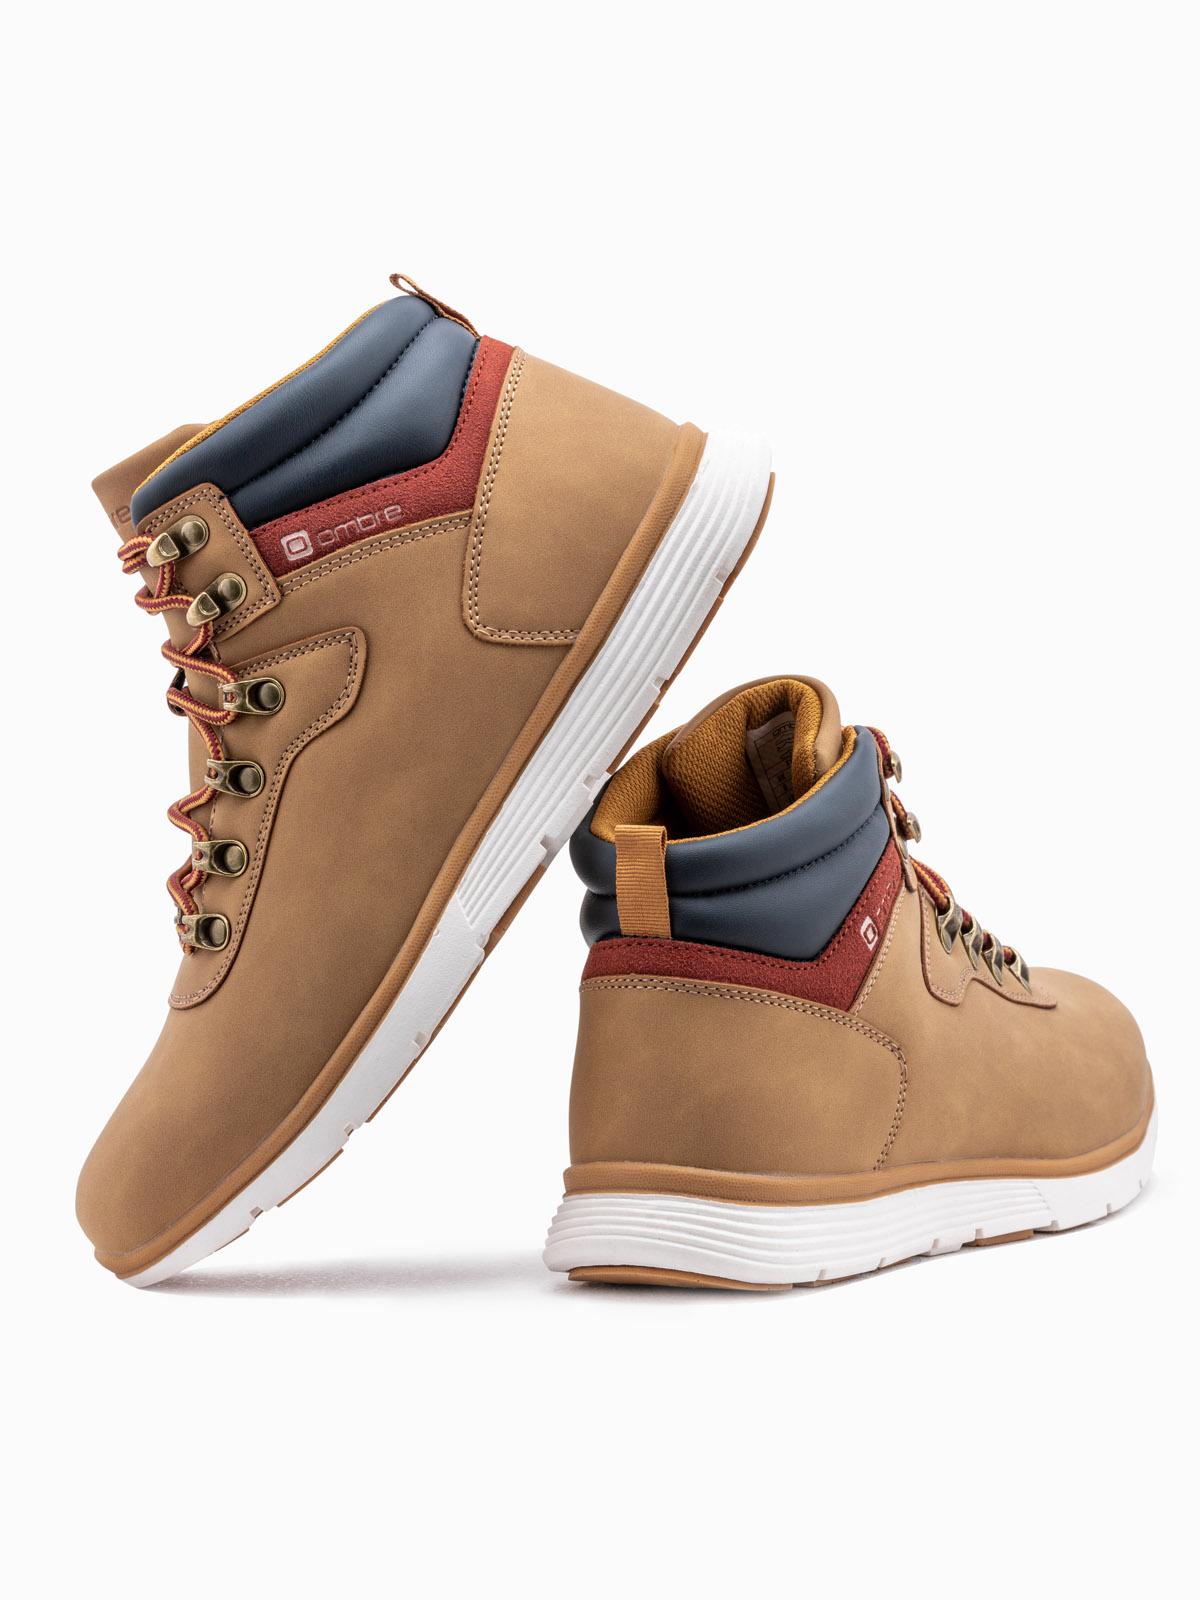 Men's winter shoes trappers T312 beige | MODONE wholesale